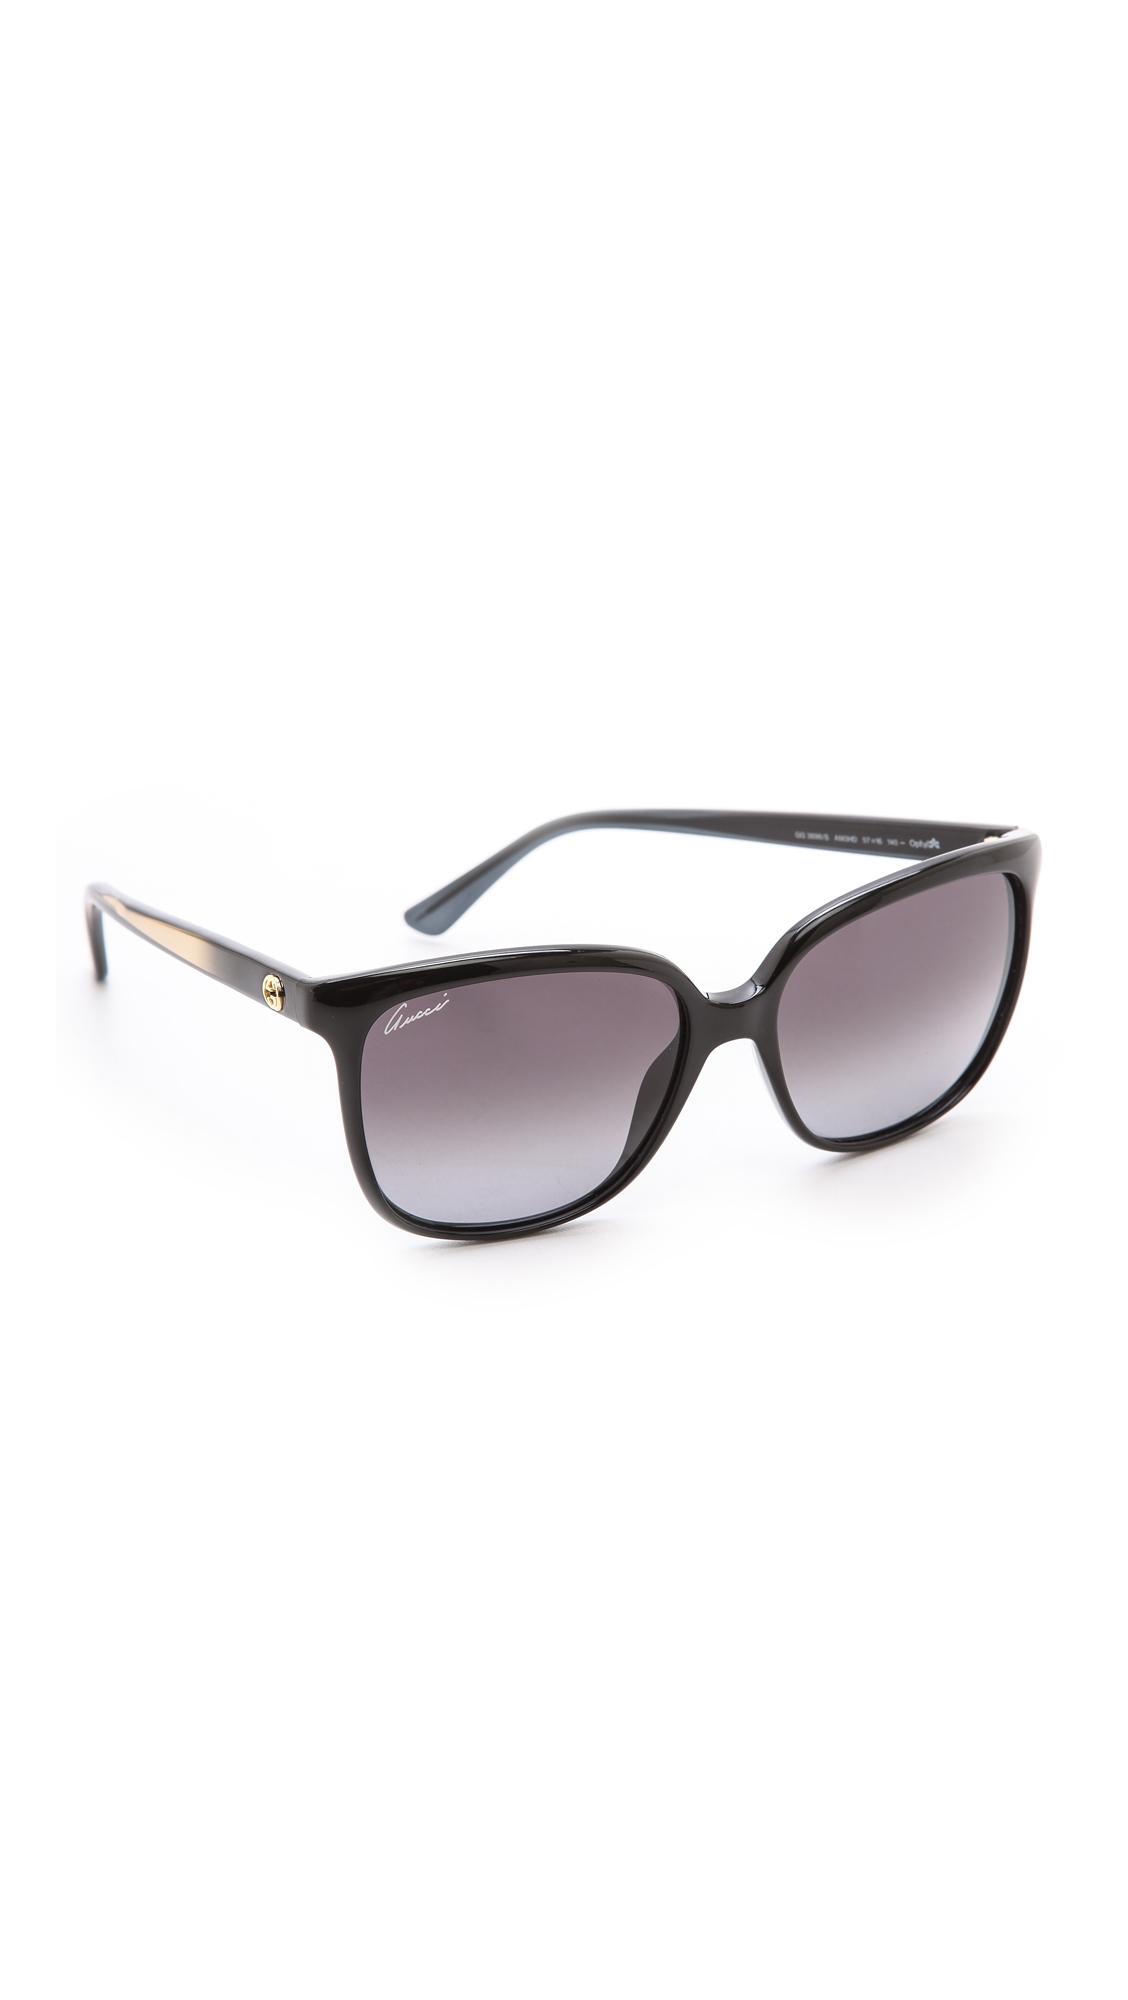 37f43249f2f Gucci Square Gradient Sunglasses - Violet Brown Gradient in Black - Lyst